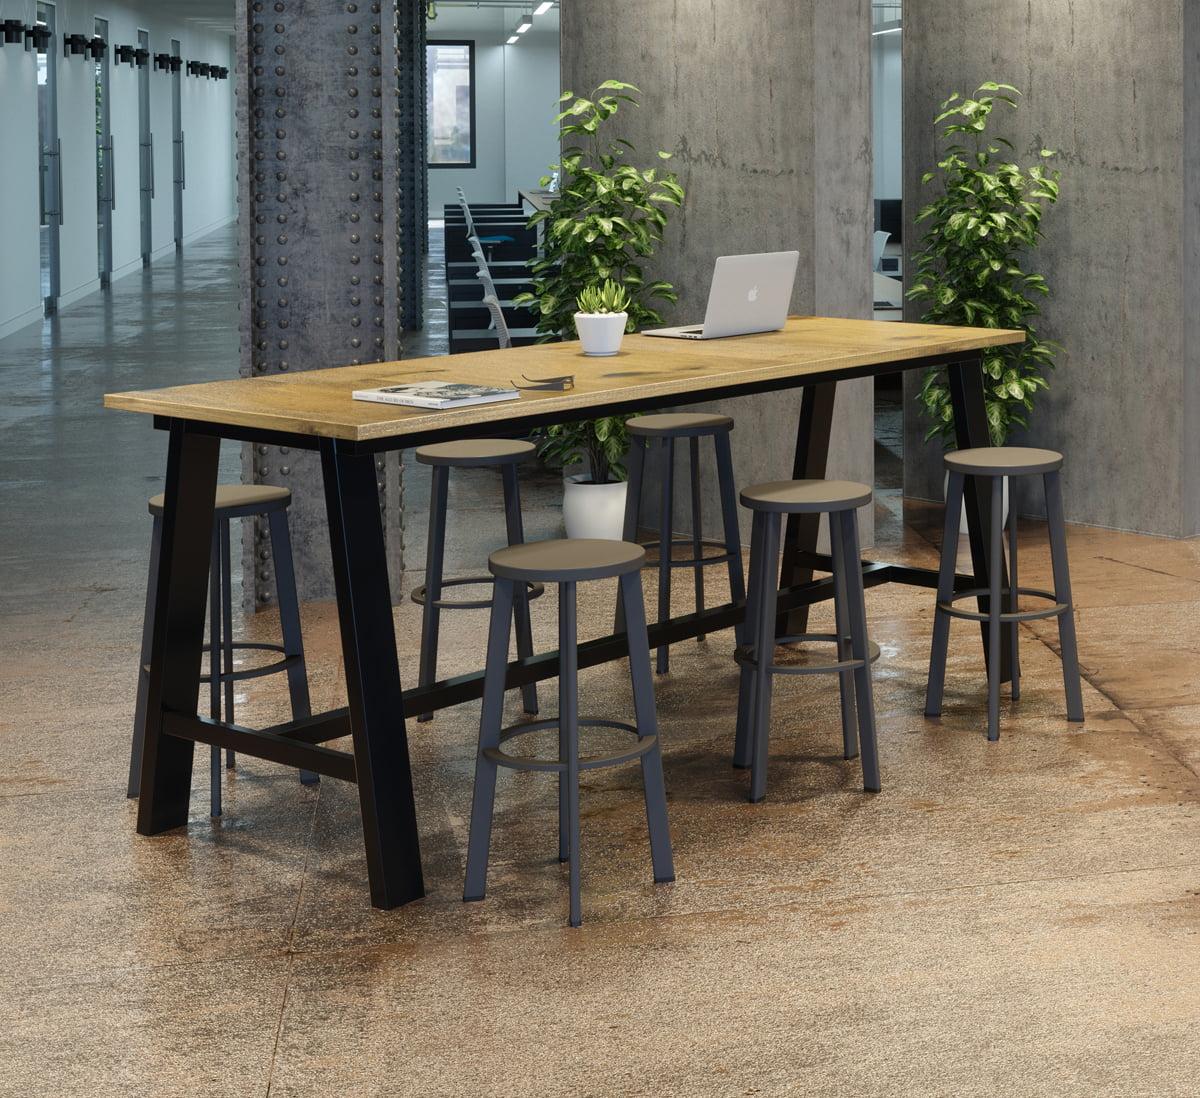 KFI Midtown 3.5 x 10 FT Multipurpose Table, Espresso Finish, Standard Height